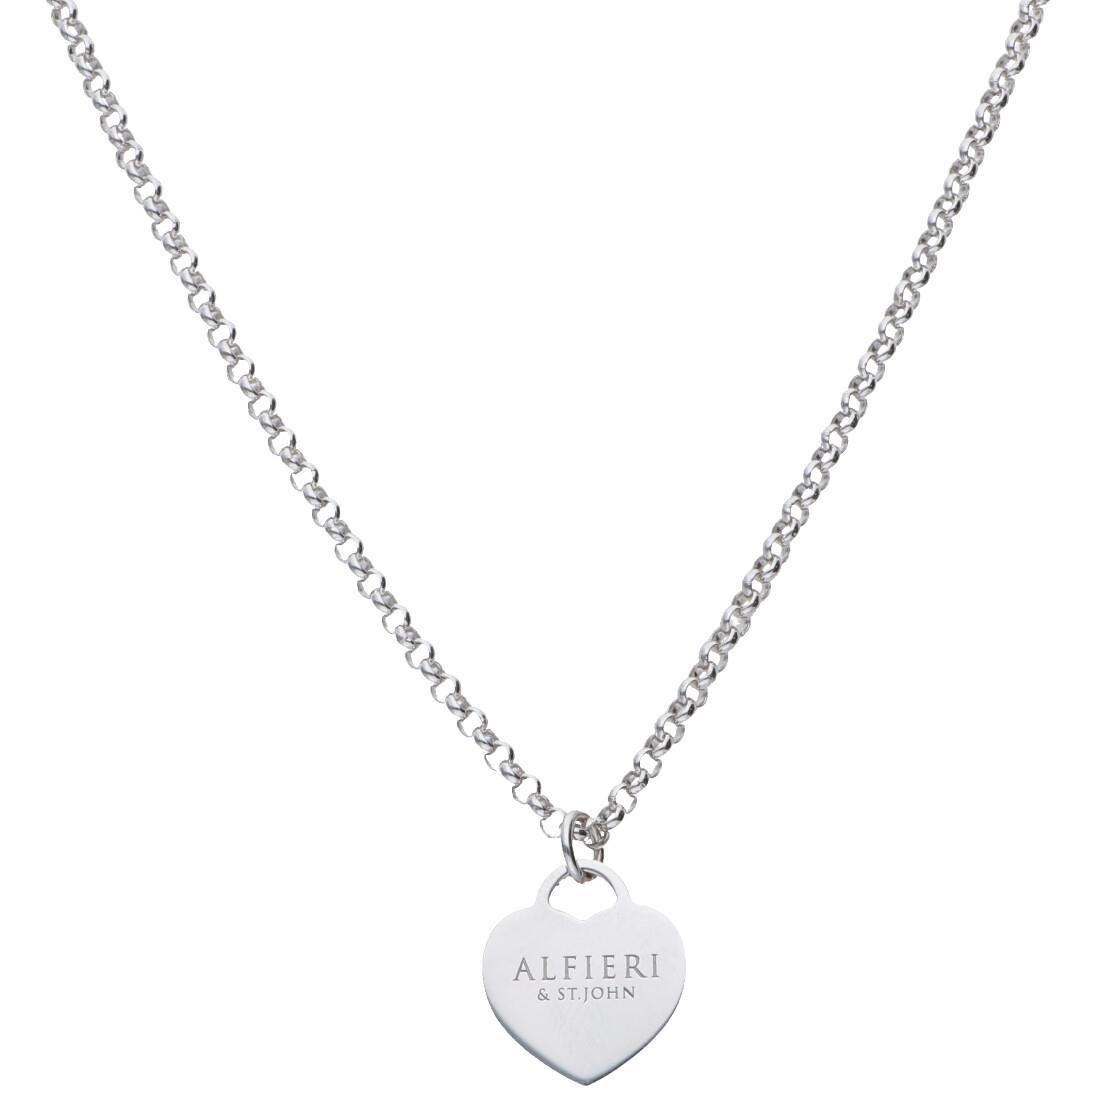 Collana in argento con pendente - ALFIERI & ST. JOHN 925